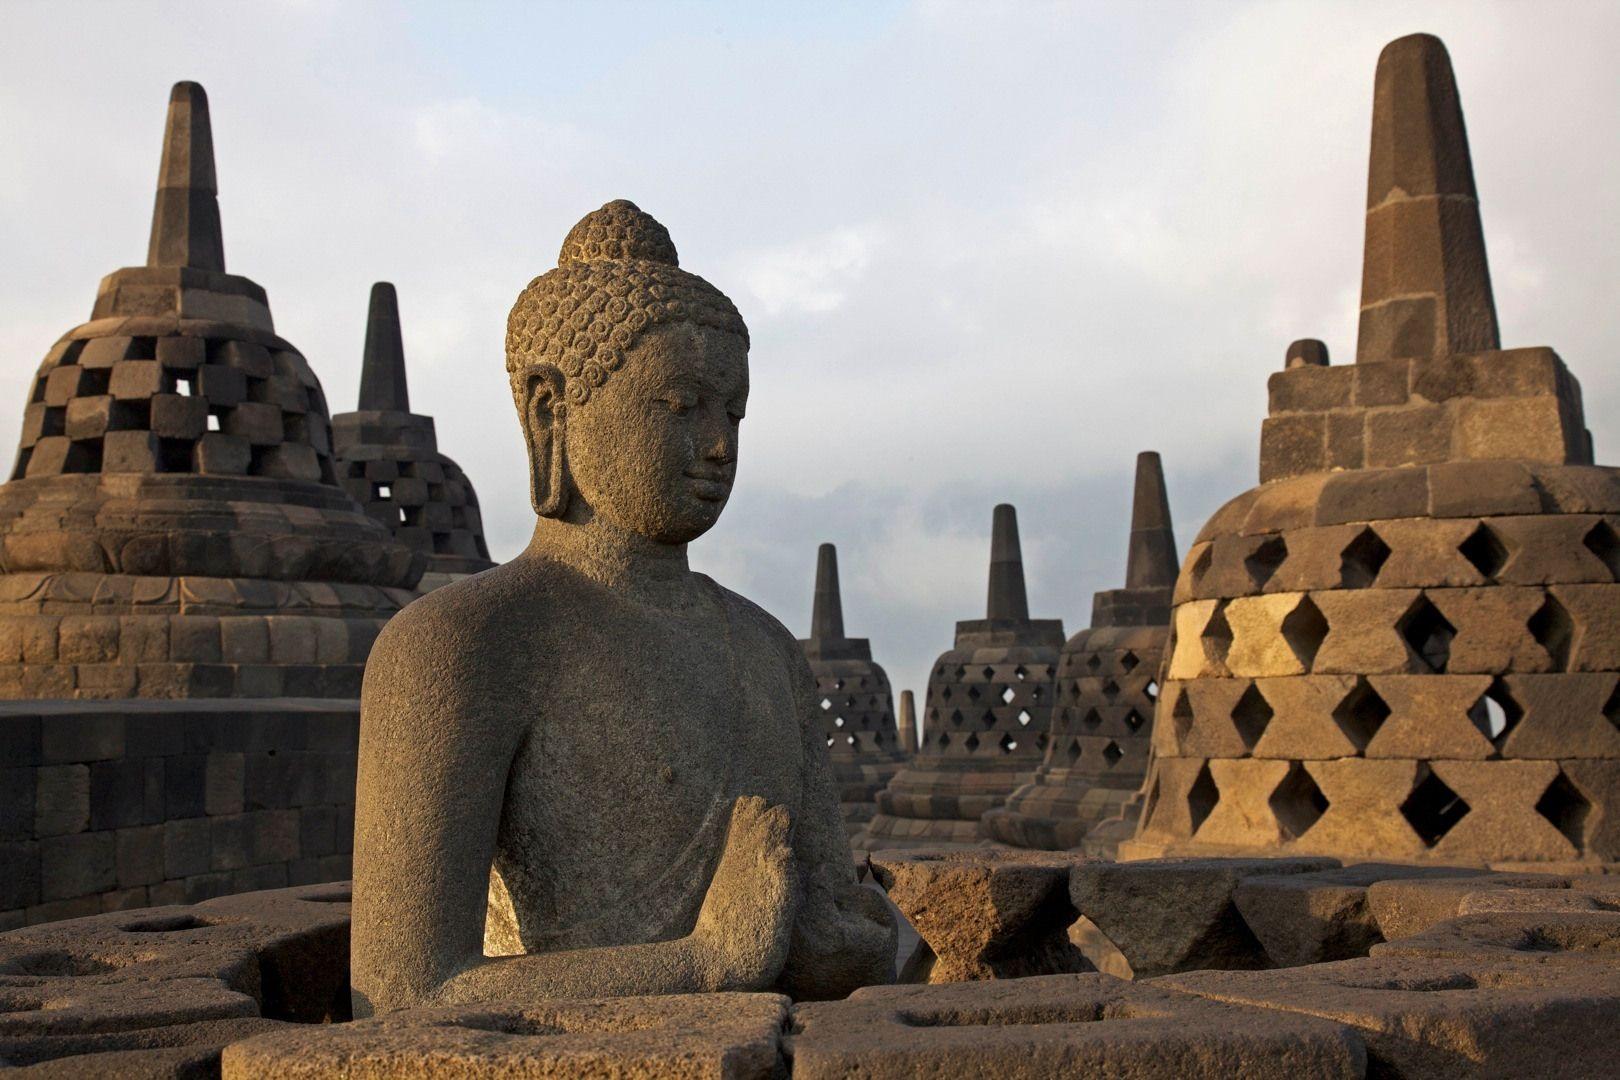 Borobudur, a Buddhist Monument in Indonesia